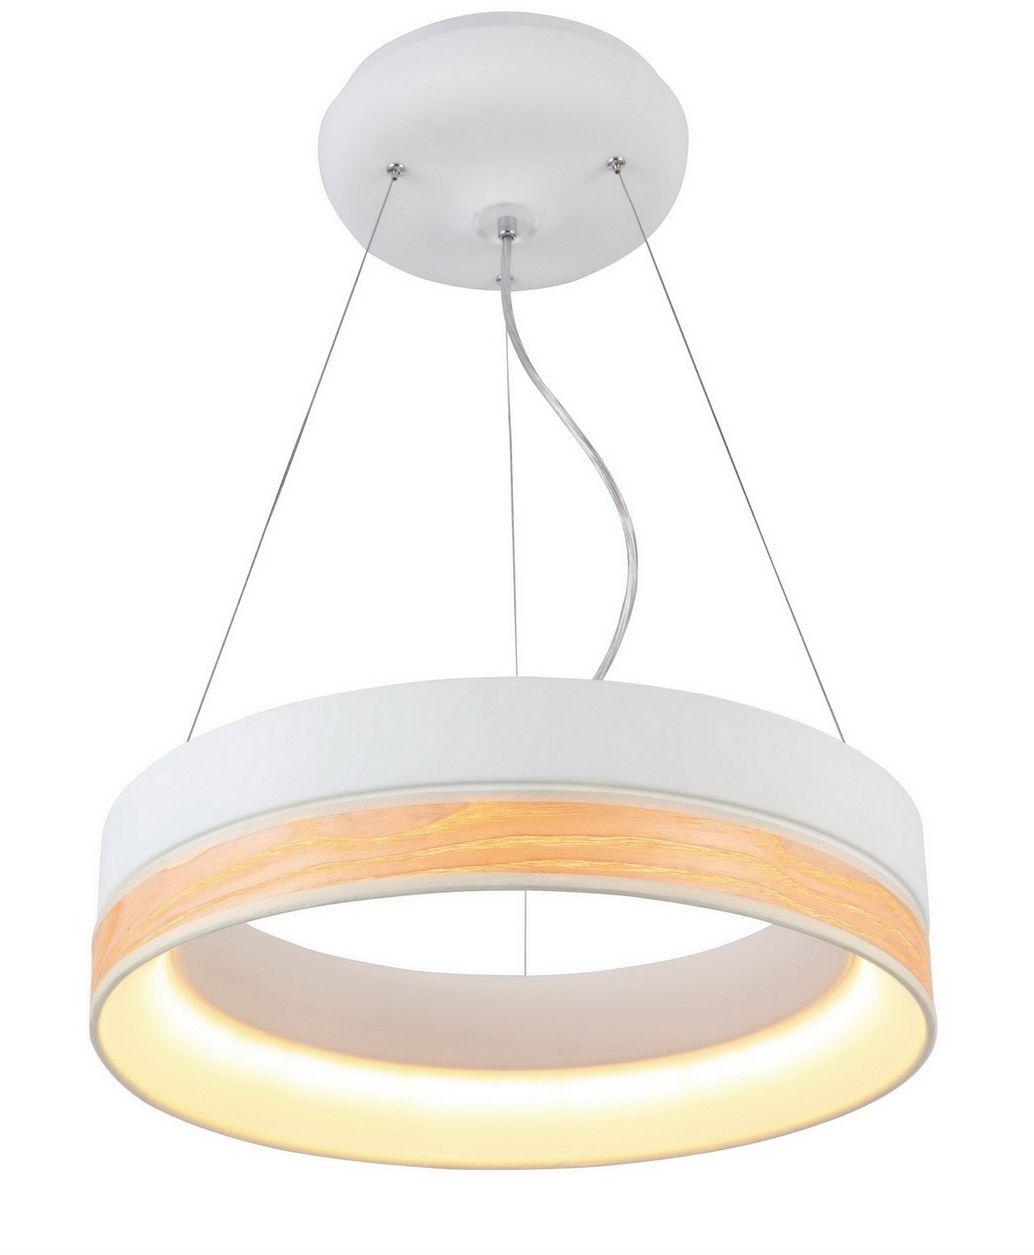 Светильник подвесной Favourite Ledino, 1 х LED, 43. 1357-120P favourite ledino 1357 120p